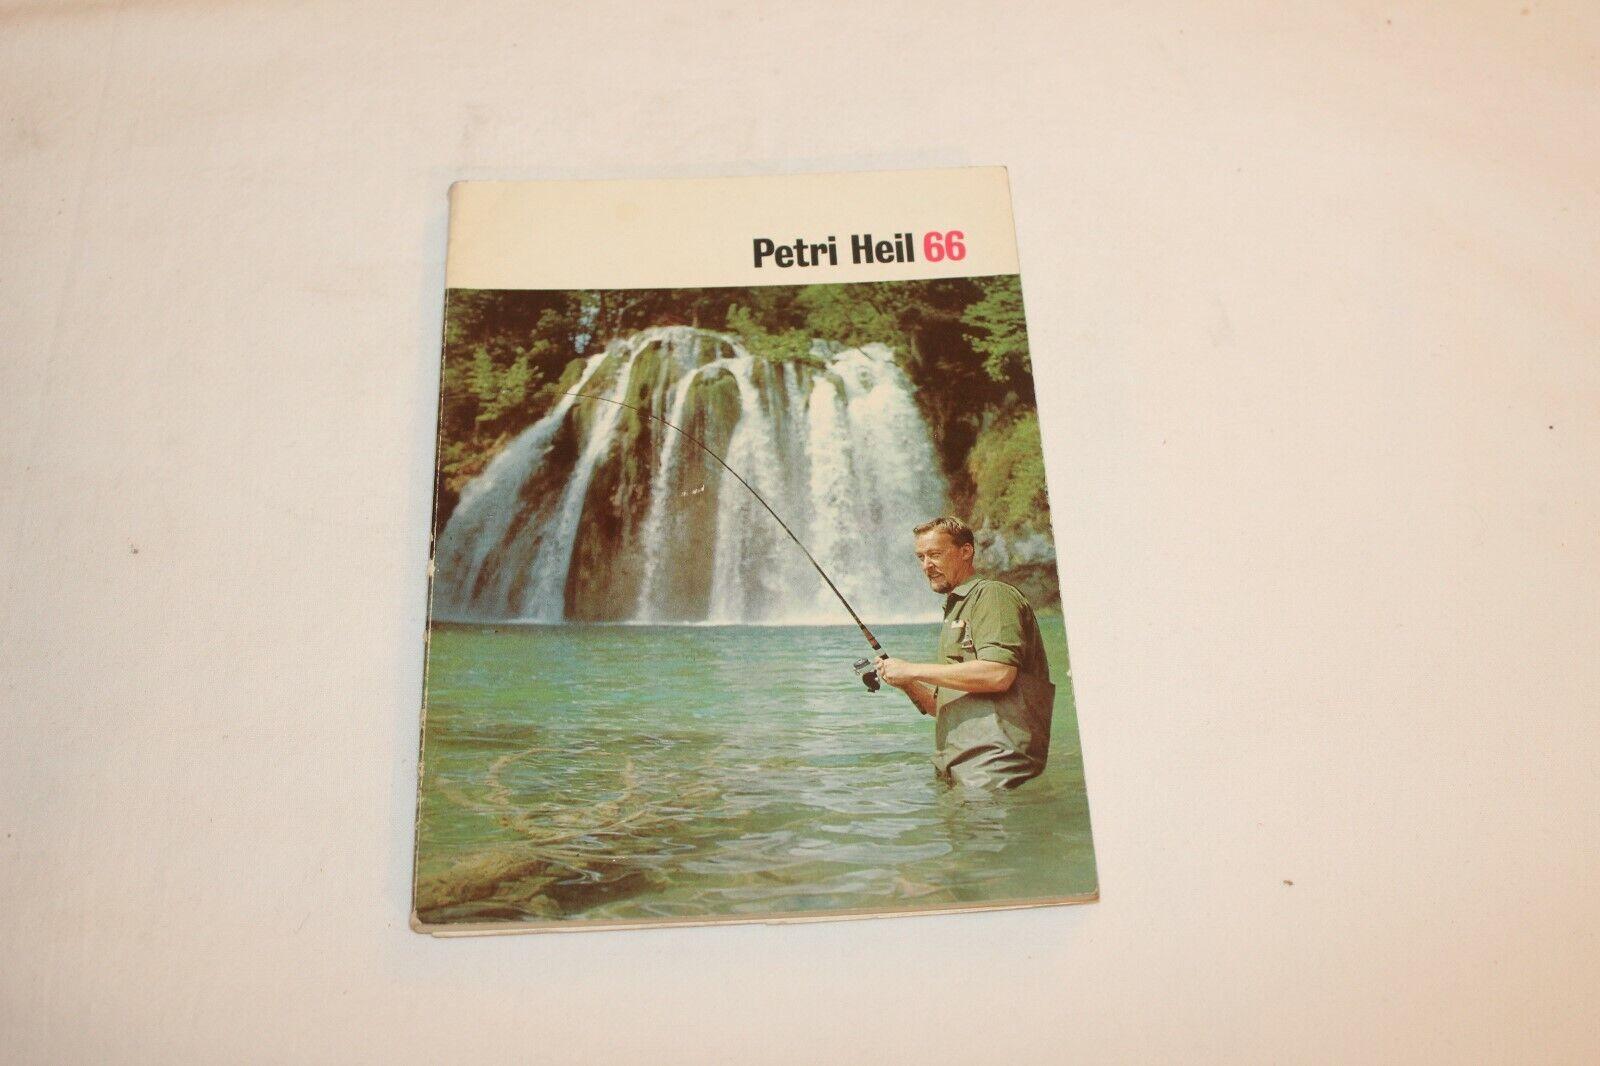 Abu catalogo listino prezzi 1966mit  tedesco